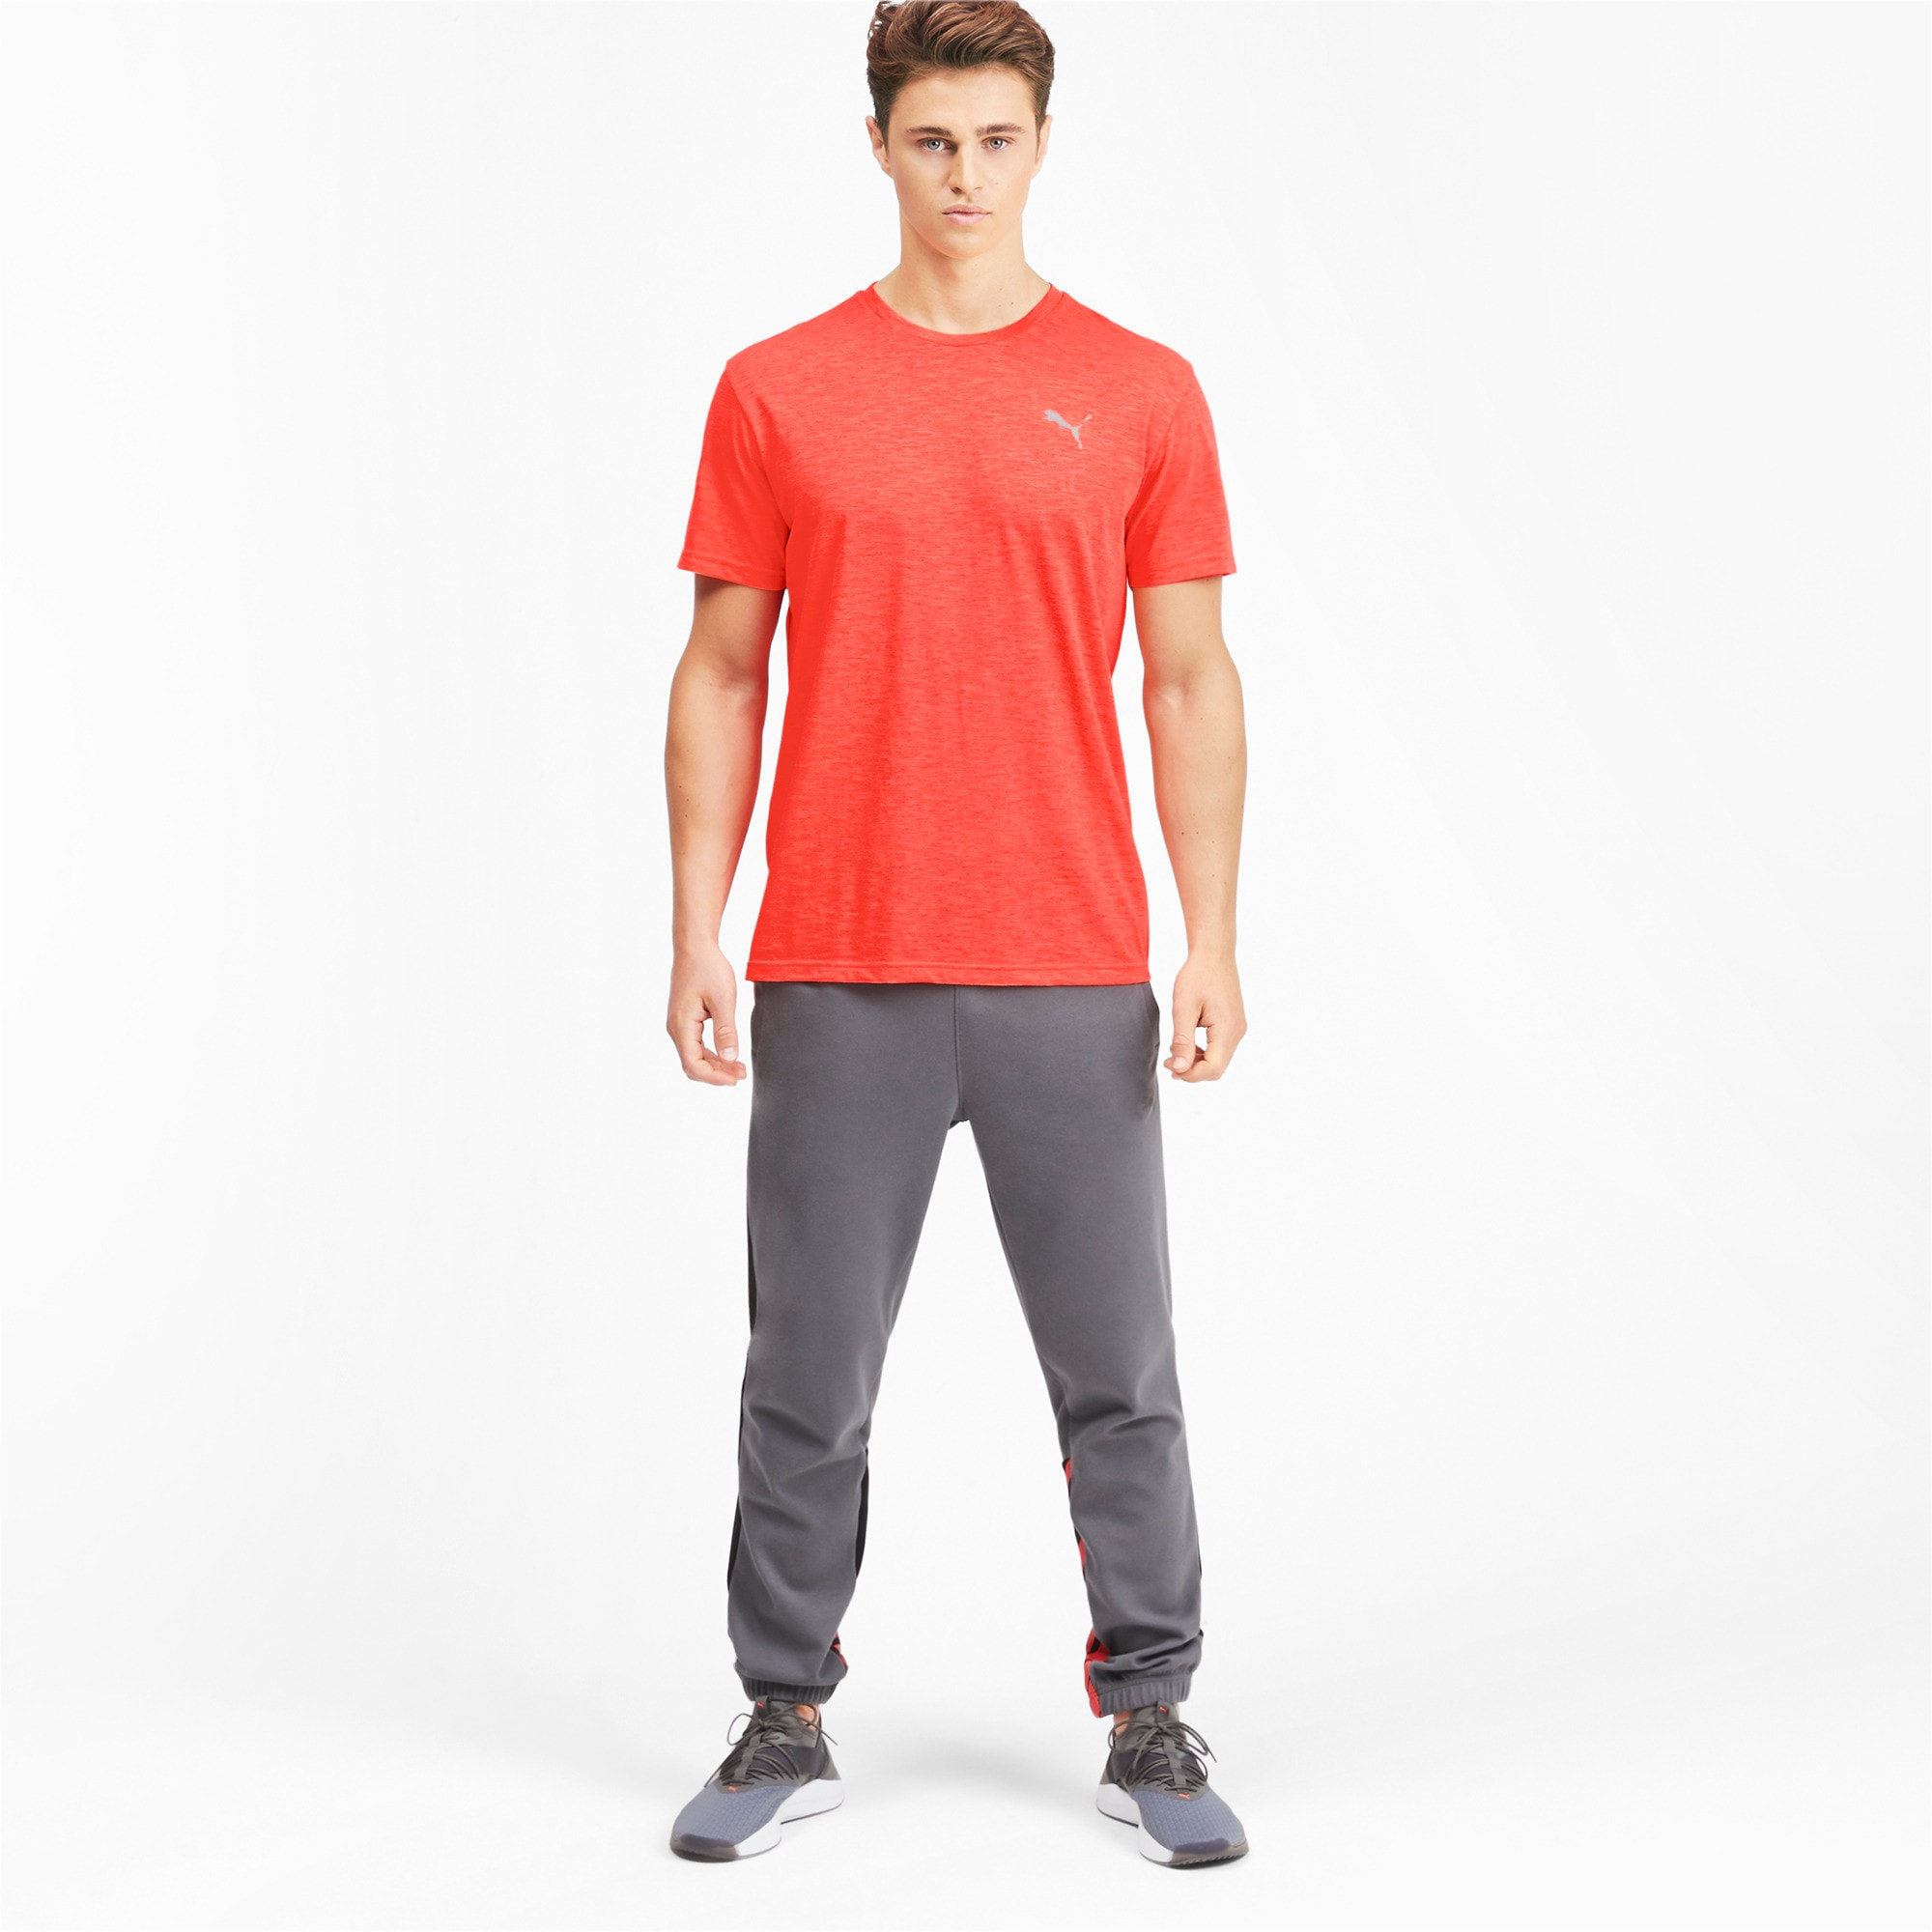 Thumbnail 3 of Energy Herren Training T-Shirt, Nrgy Red Heather, medium